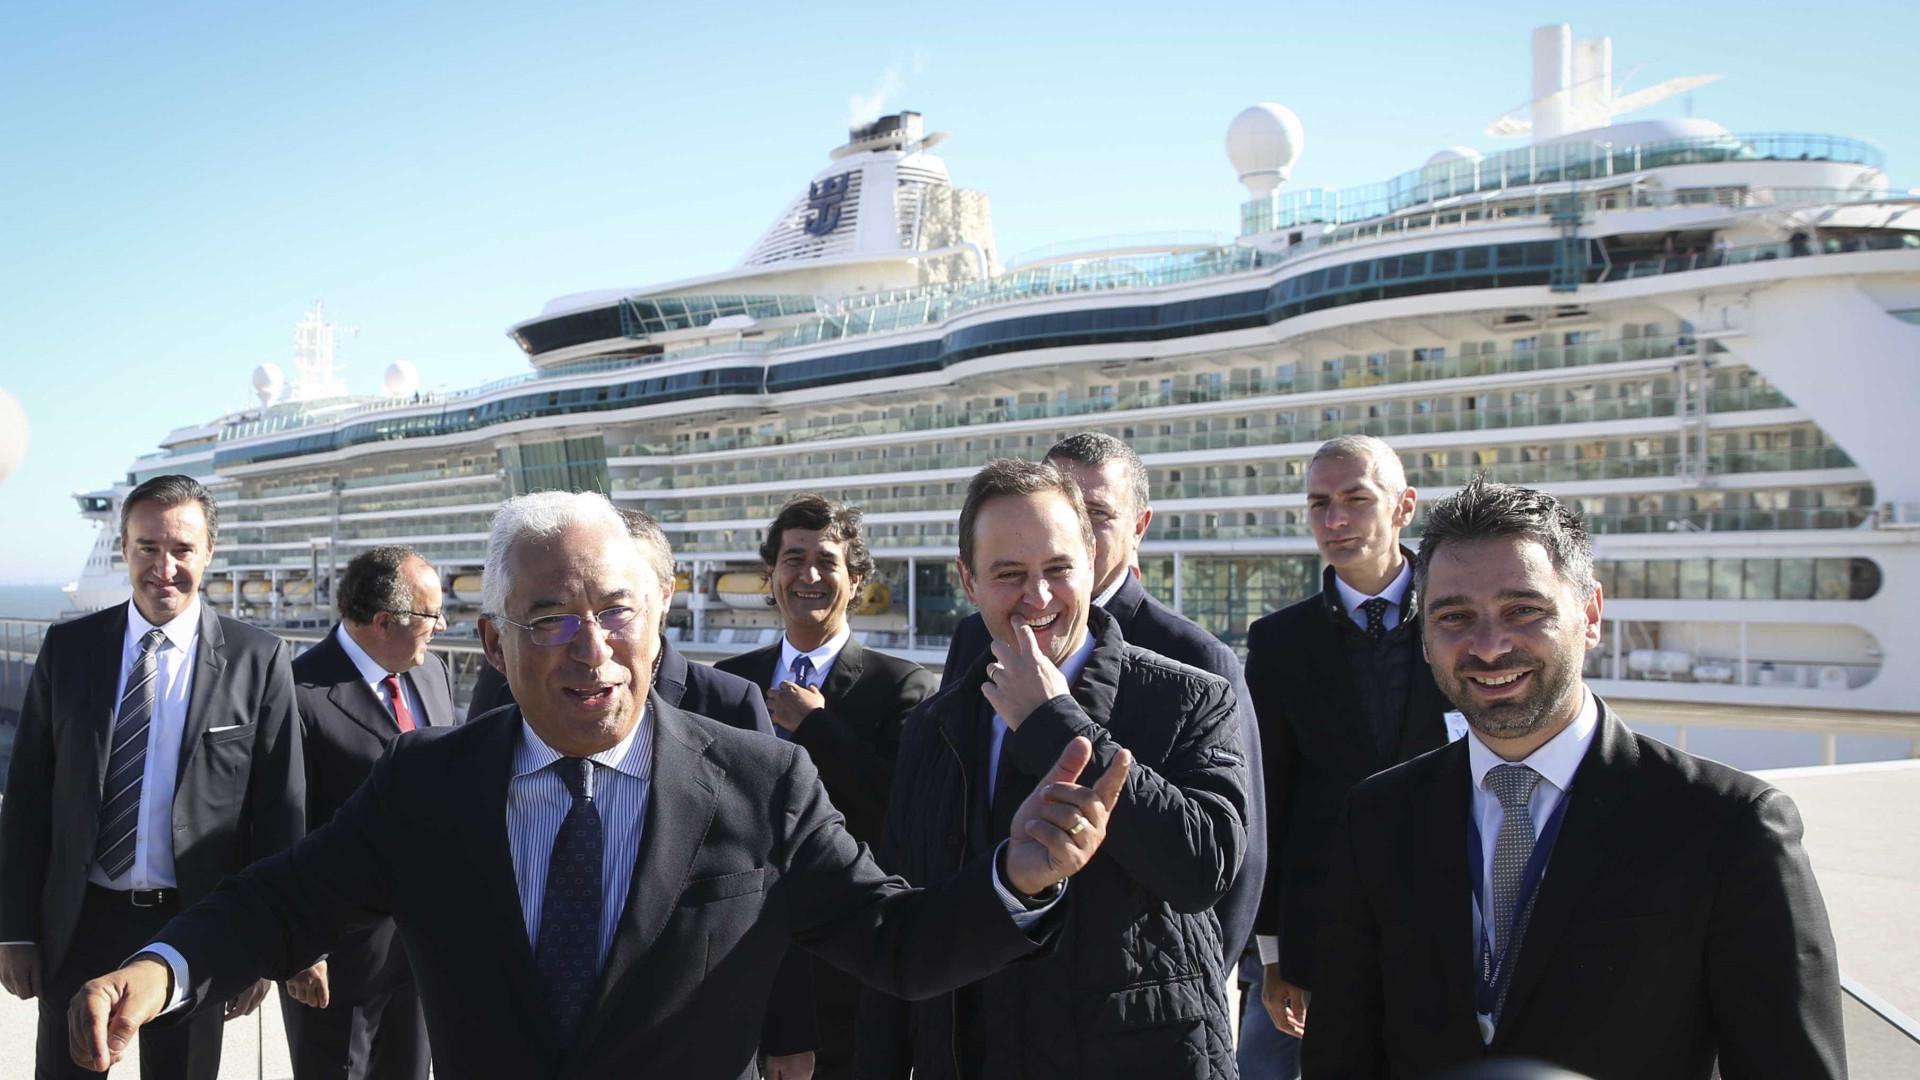 Foi inaugurado (finalmente) o novo porto de cruzeiros de Lisboa